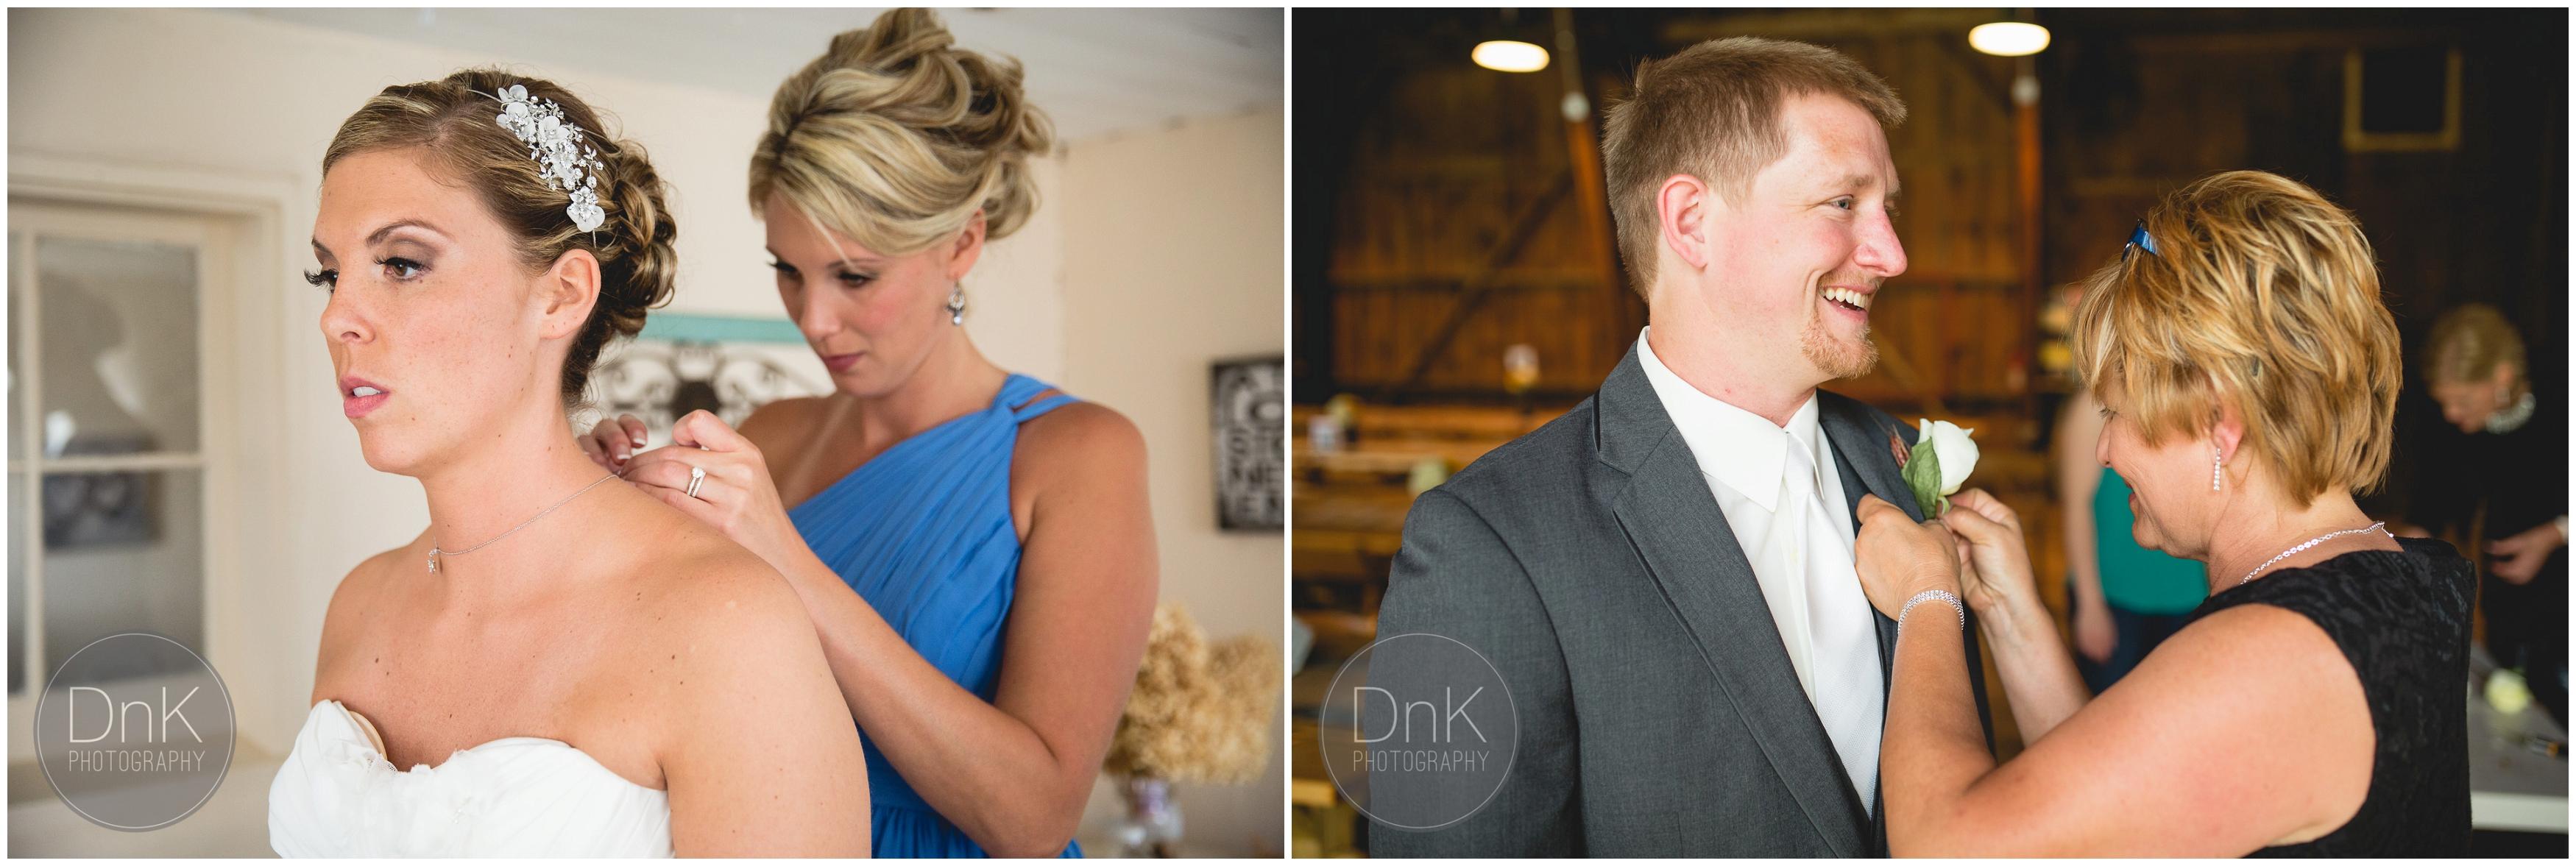 04- Dellwood Barn Wedding Photographer